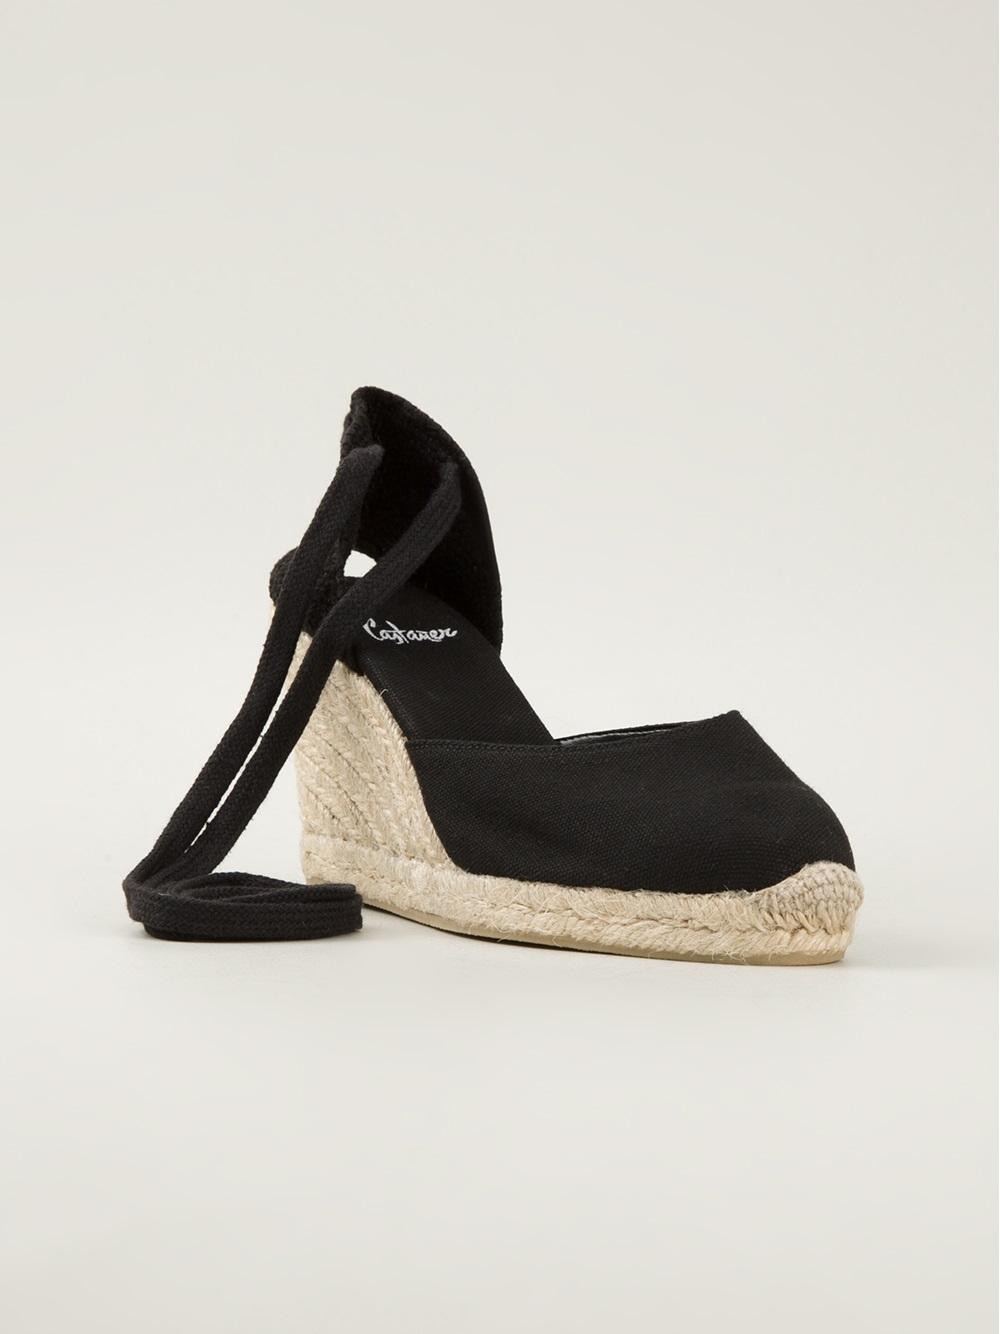 Lyst Castaner Carina Espadrille Sandals In Black